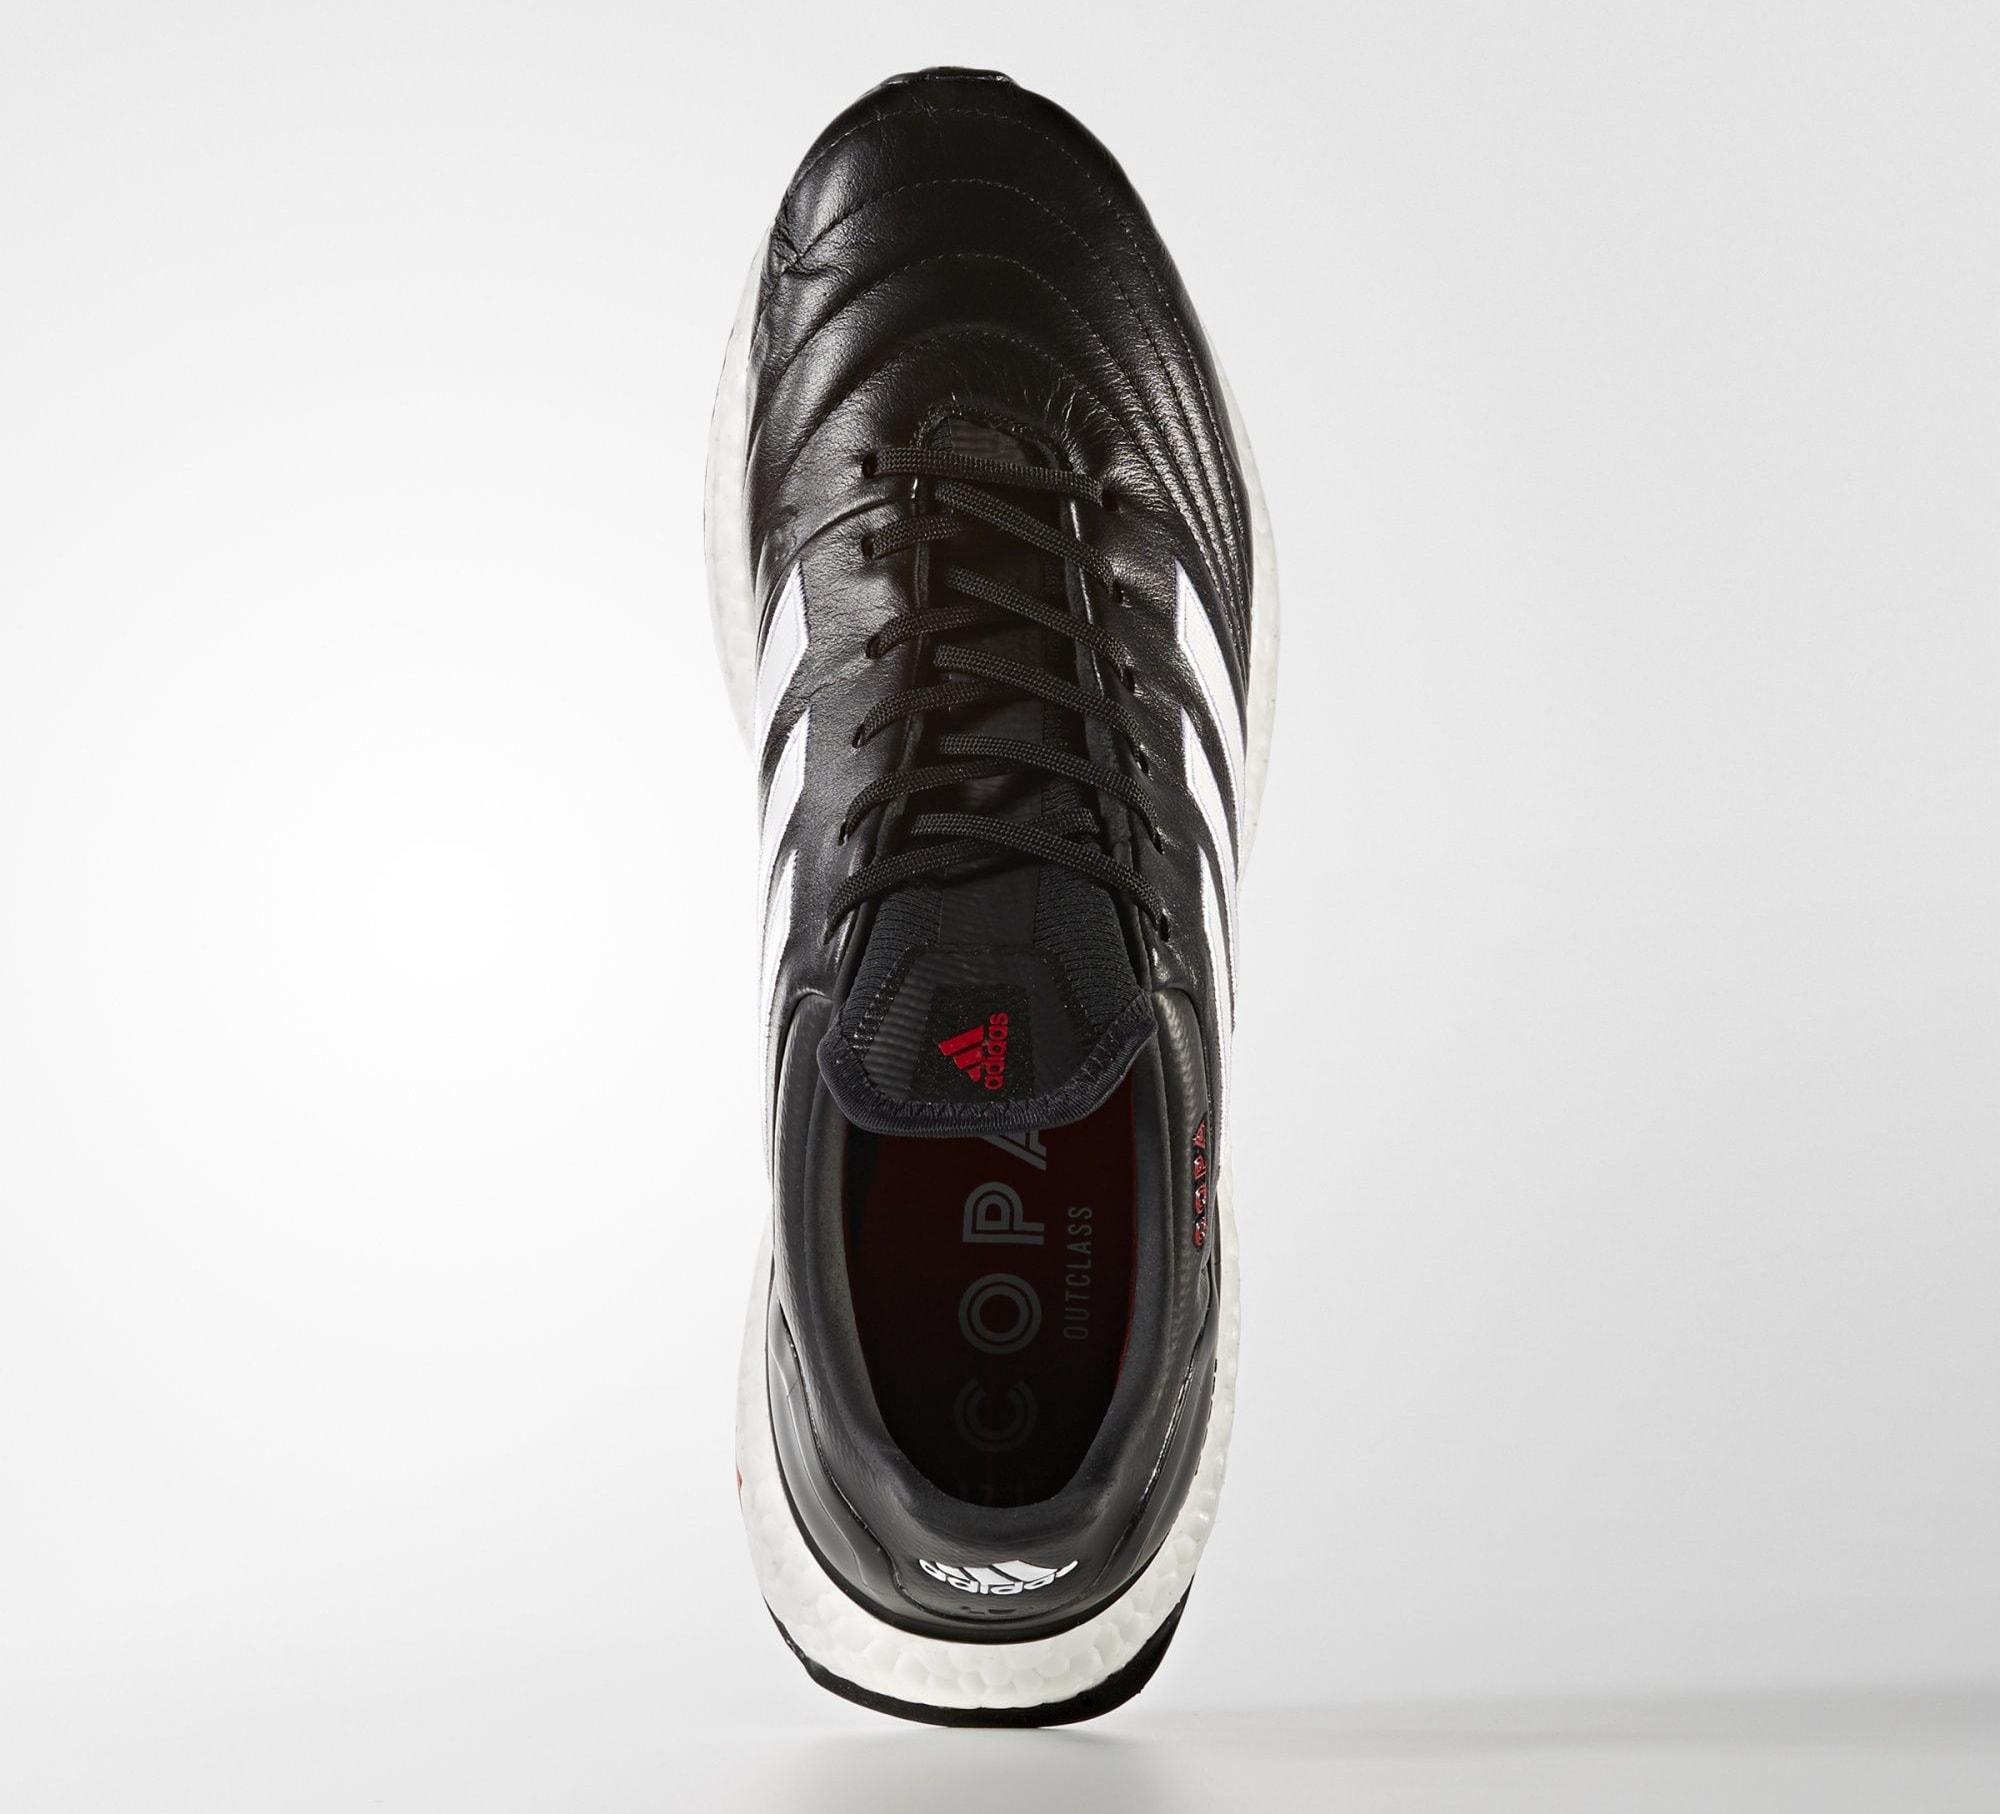 Adidas Copa 17.1 Ultra Boost